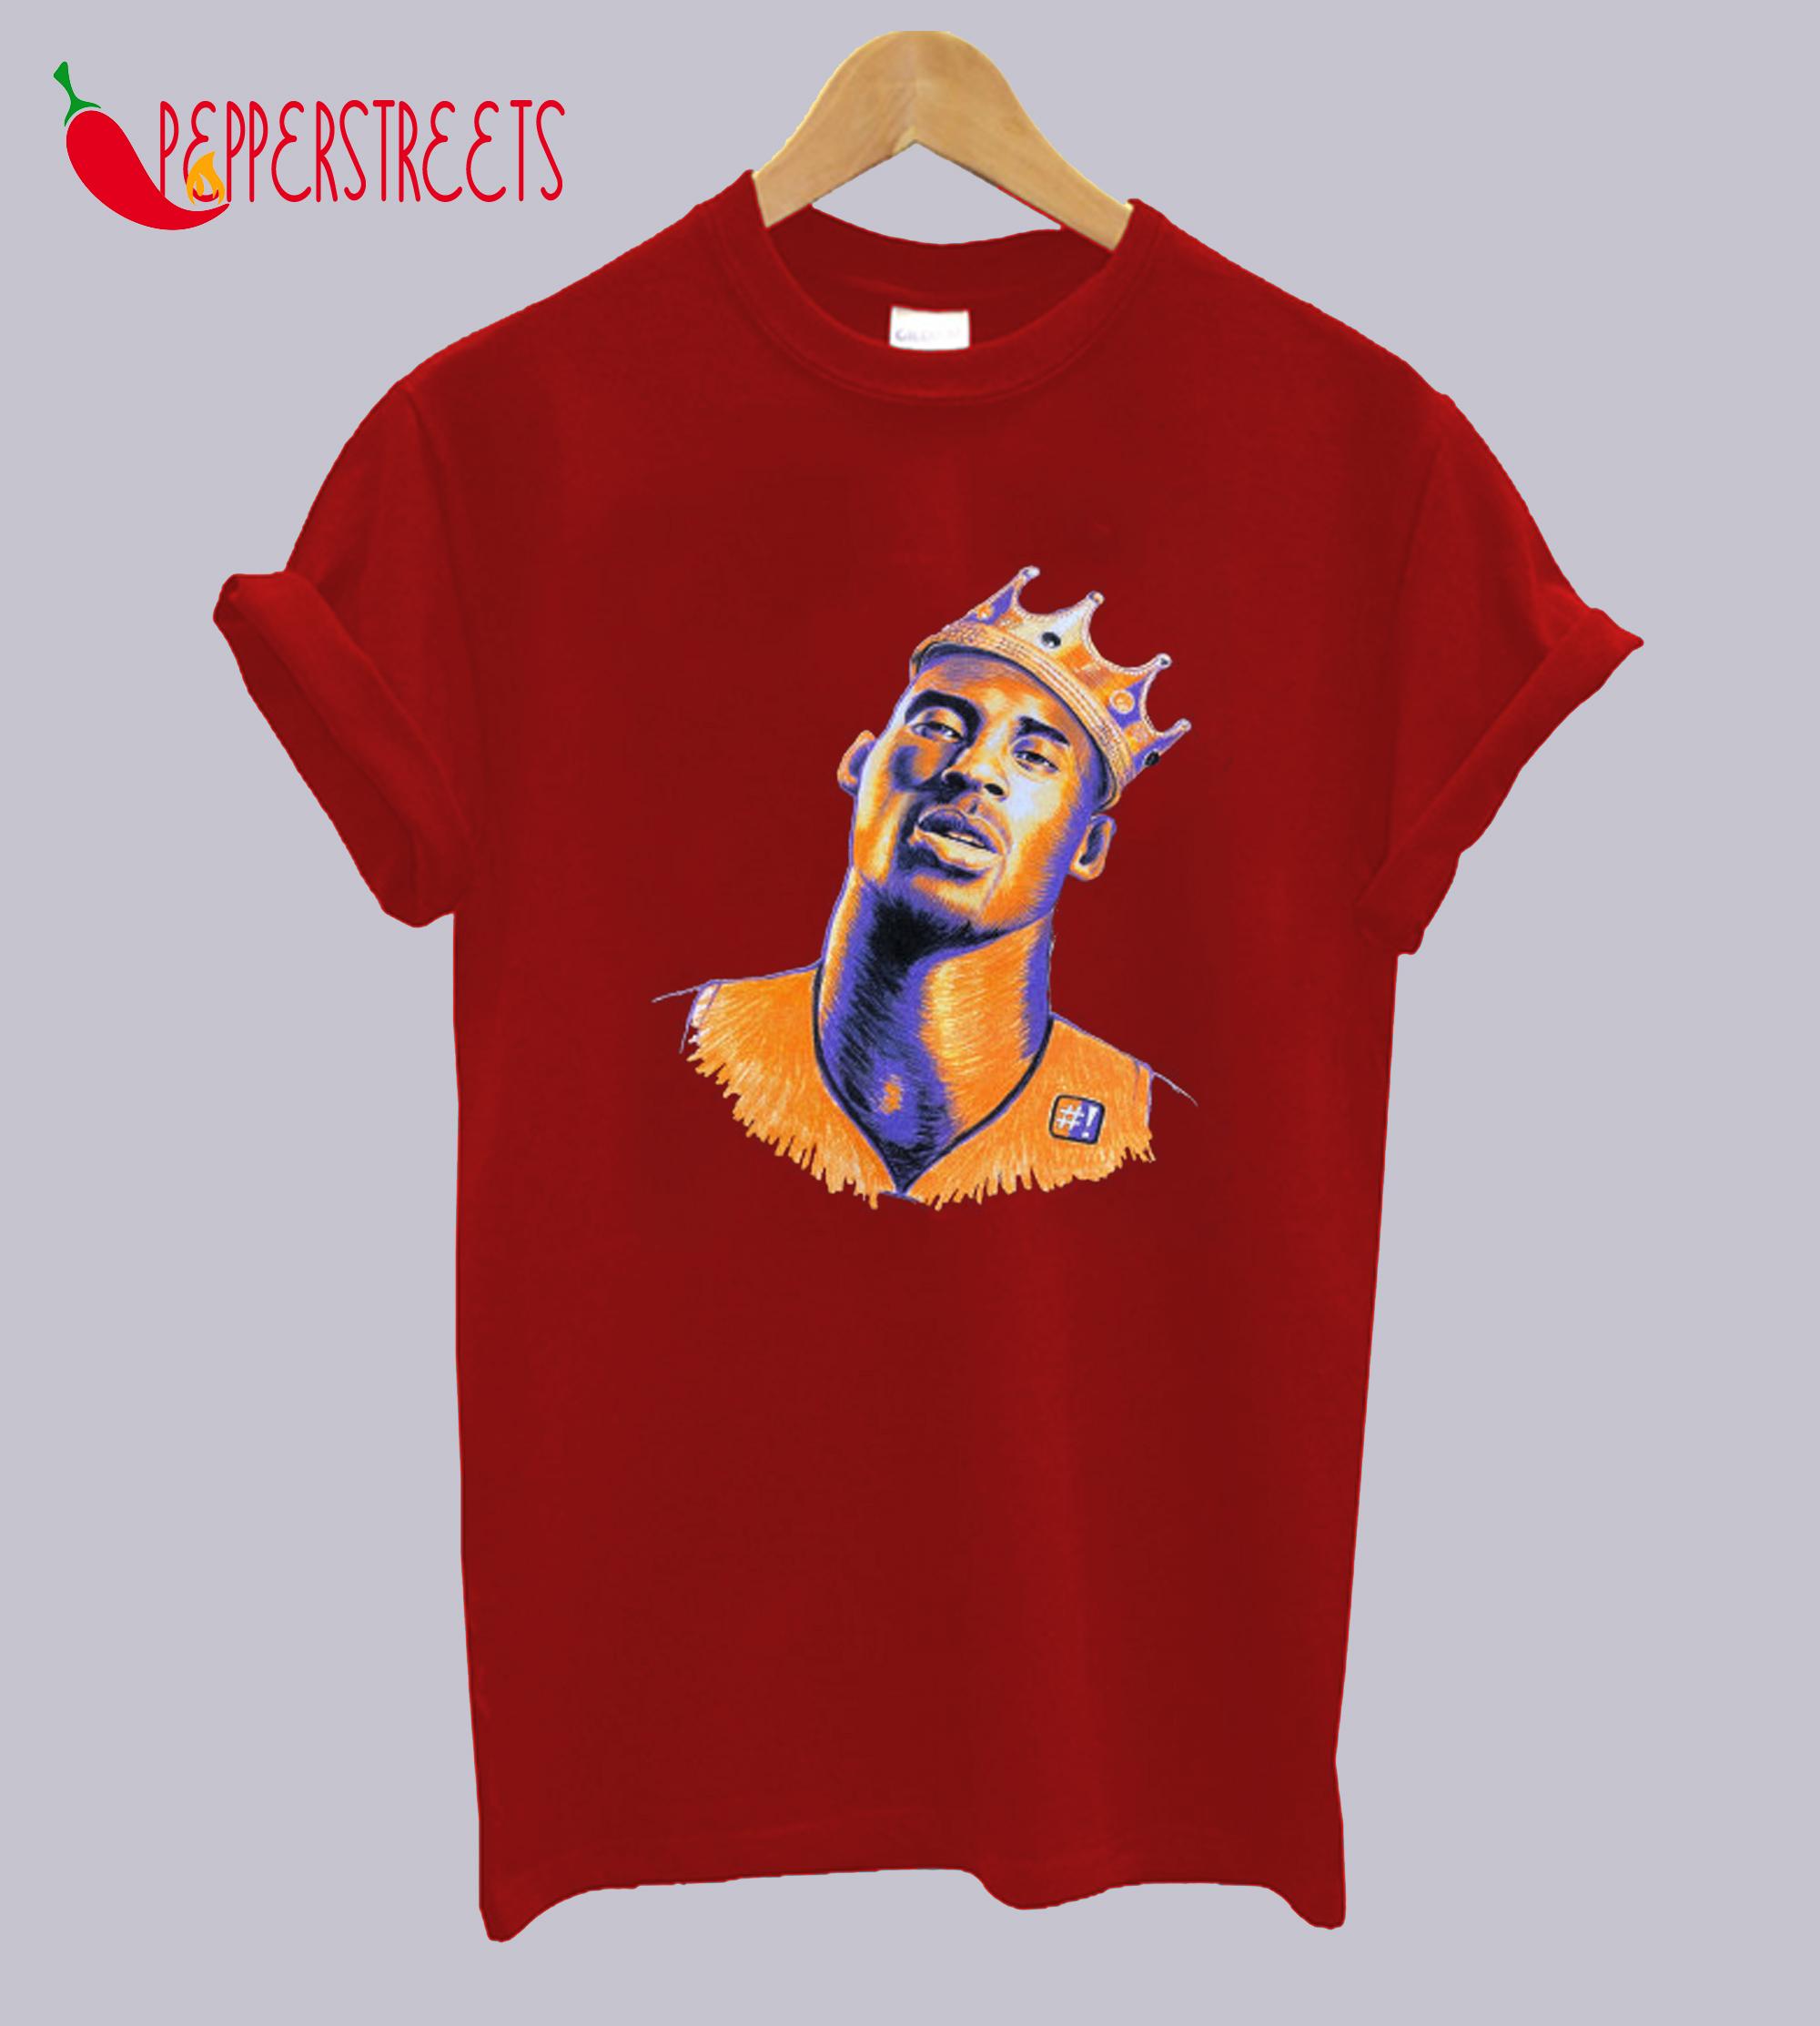 The King Black Mamba Lekers T-Shirt